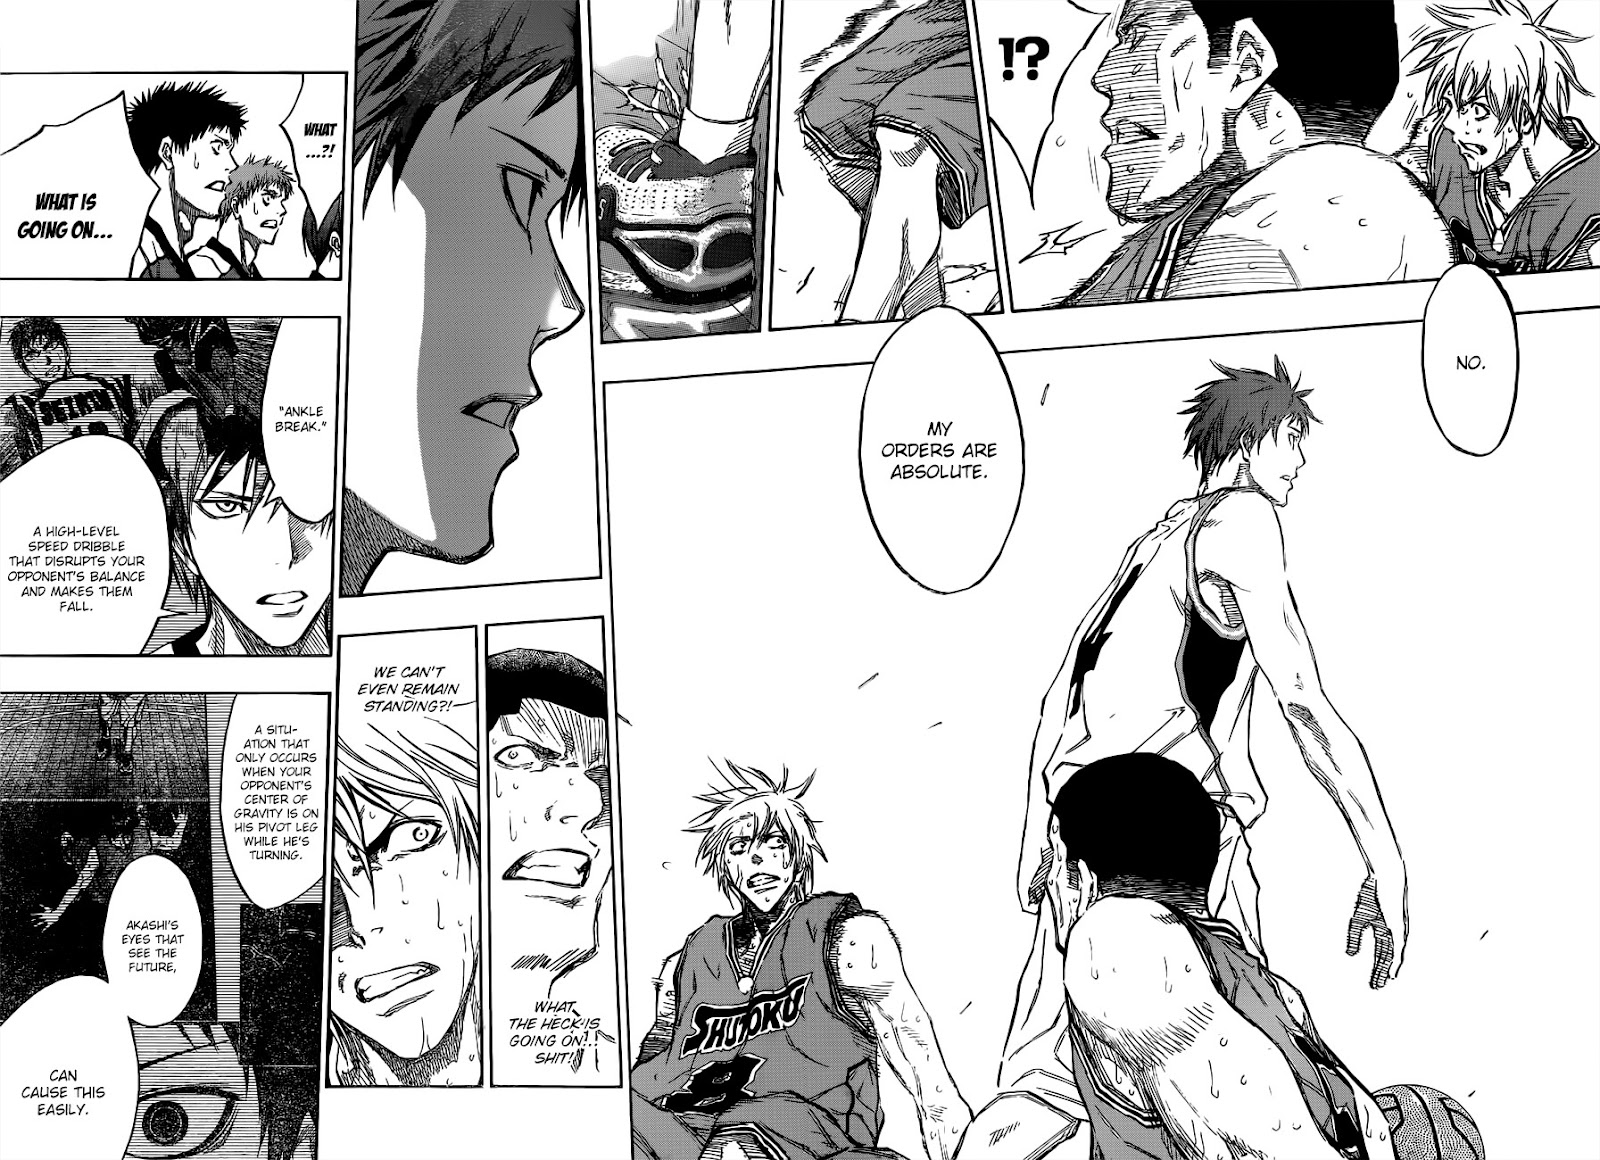 Kuroko no Basket Manga Chapter 179 - Image 08-09